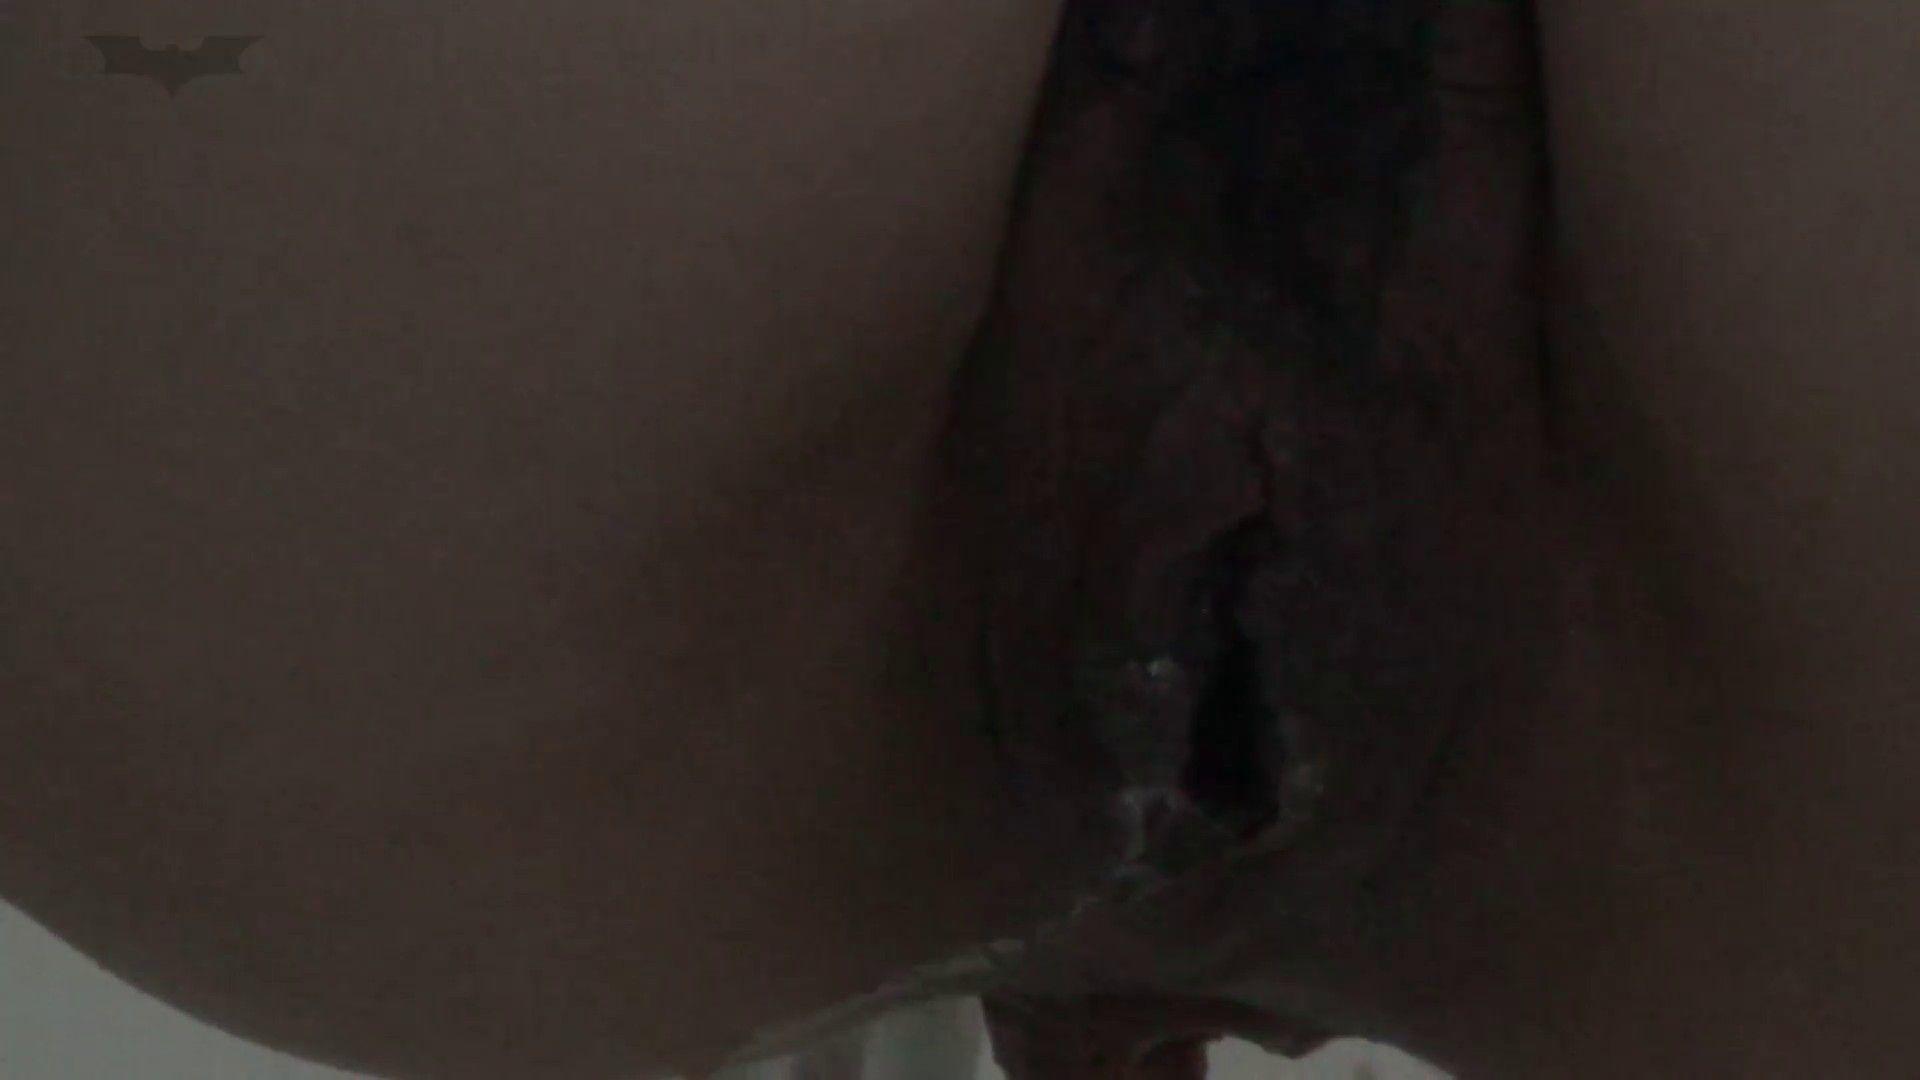 JD盗撮 美女の洗面所の秘密 Vol.21 盗撮 SEX無修正画像 95枚 68